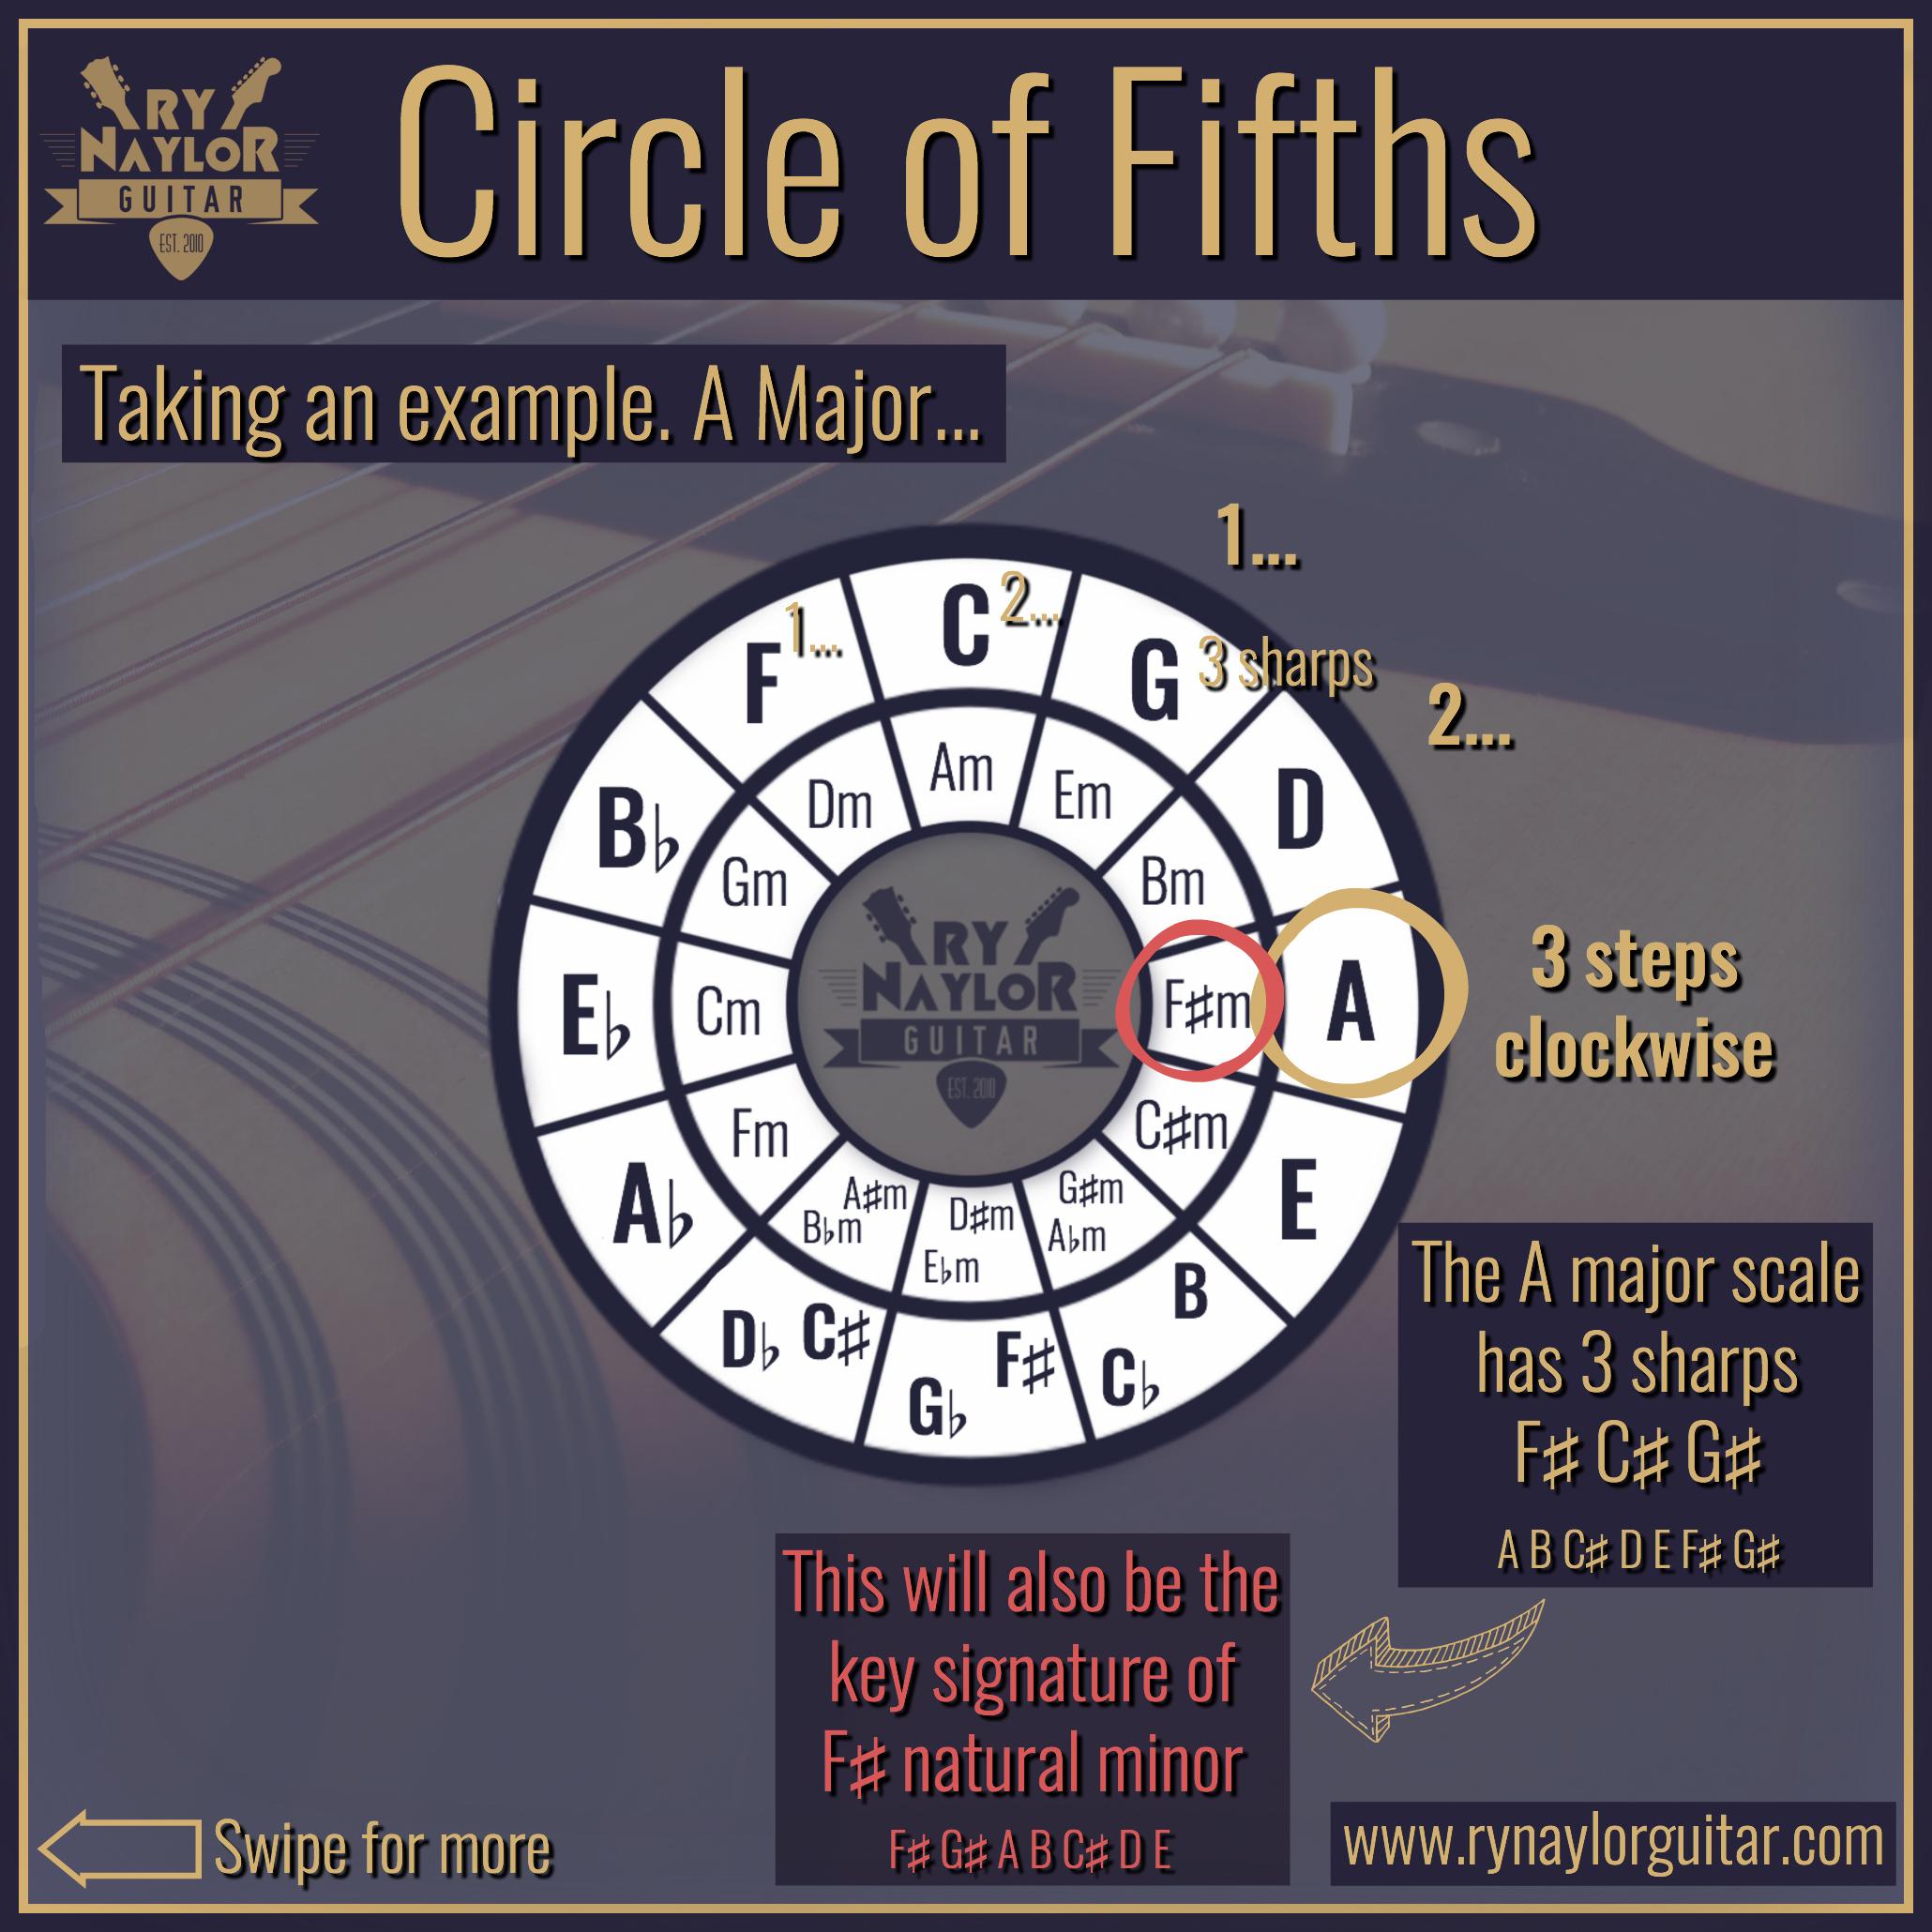 Circle of Fifths 7.jpg